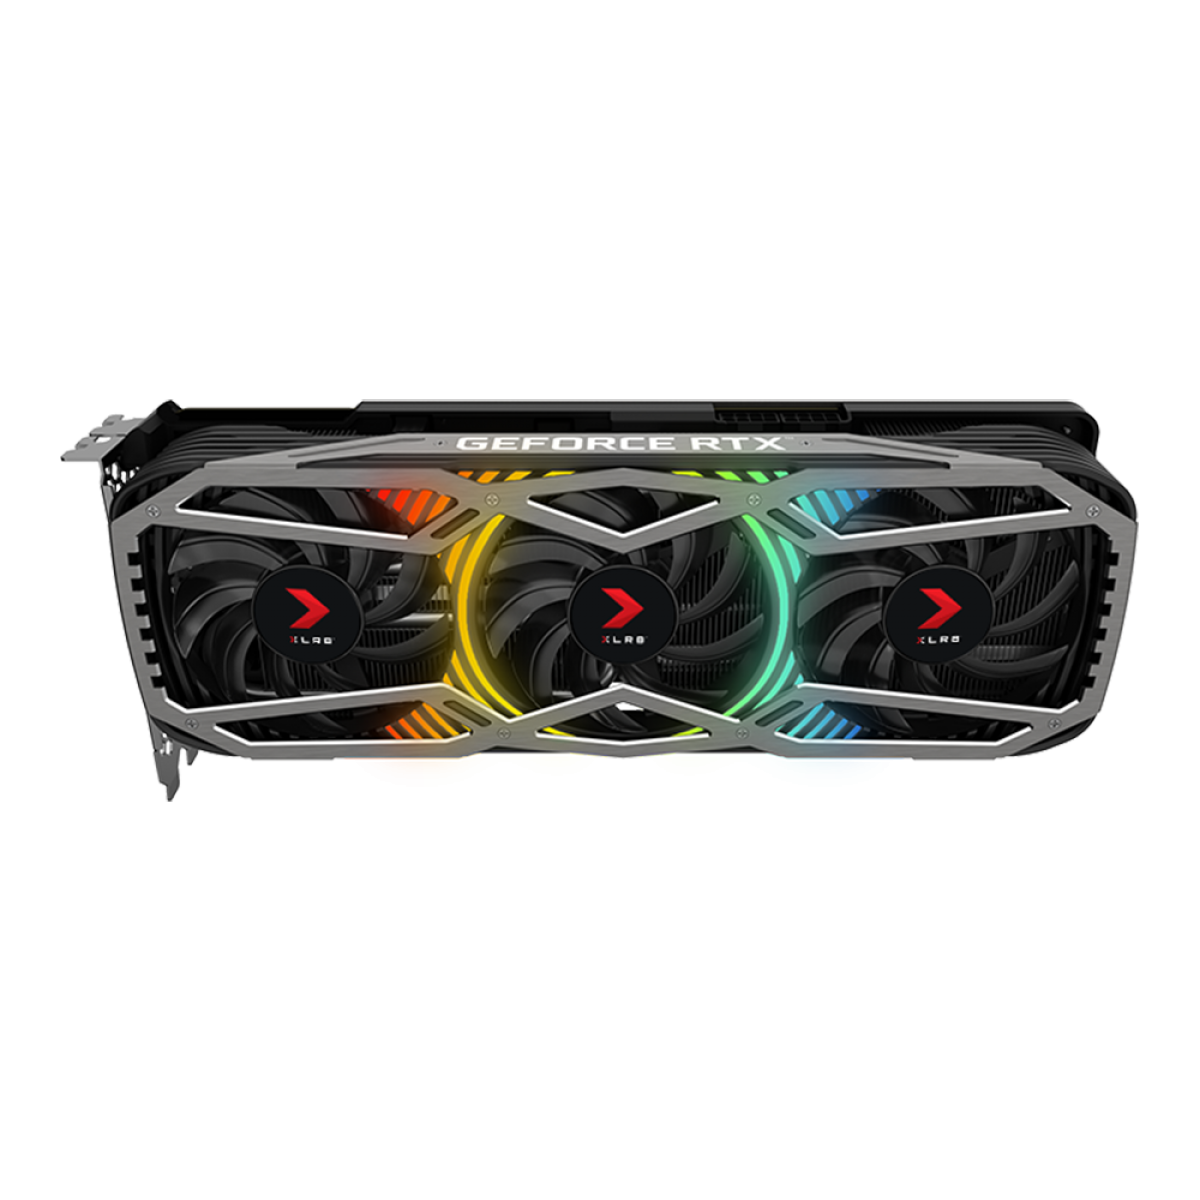 Placa de Vídeo PNY GeForce RTX 3080 XLR8 Gaming EPIC-X RGB Triple, 10GB, GDDR6X, 320Bit, VCG308010TFXPPB